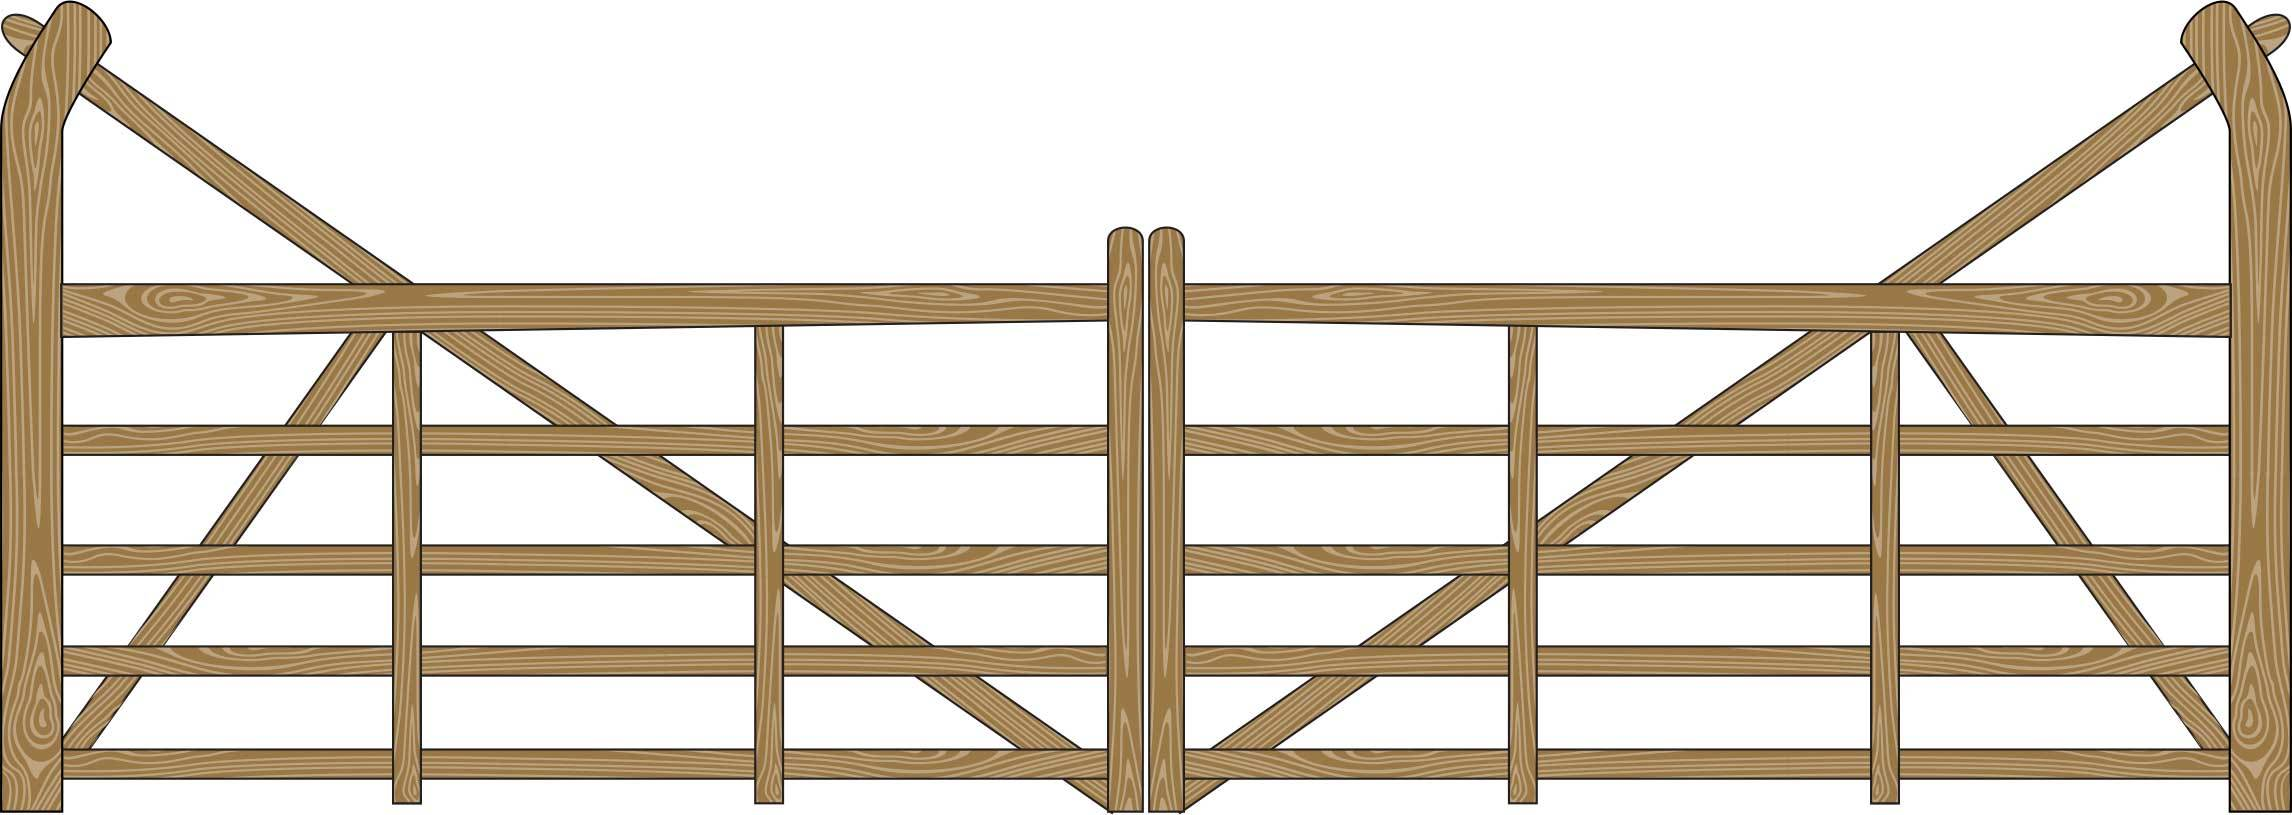 Oxley Gates Wooden 5 bar illustration